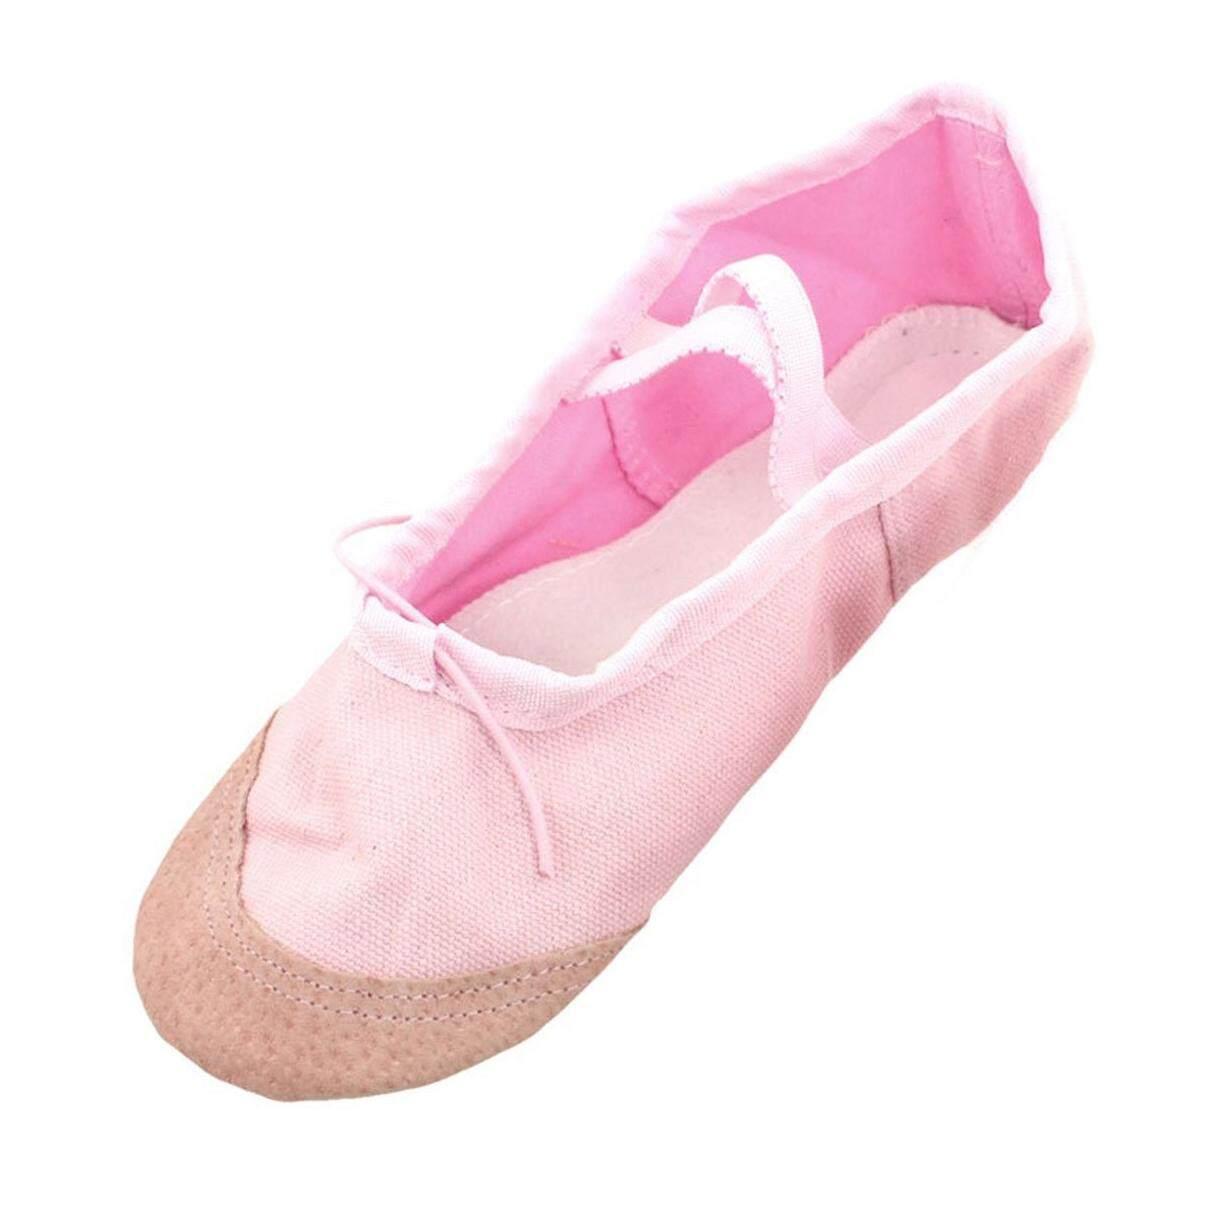 f3b30cf62b8b EU 37 Pink Faux Leather Split Sole Canvas Dancing Ballet Flats Shoes for  Women